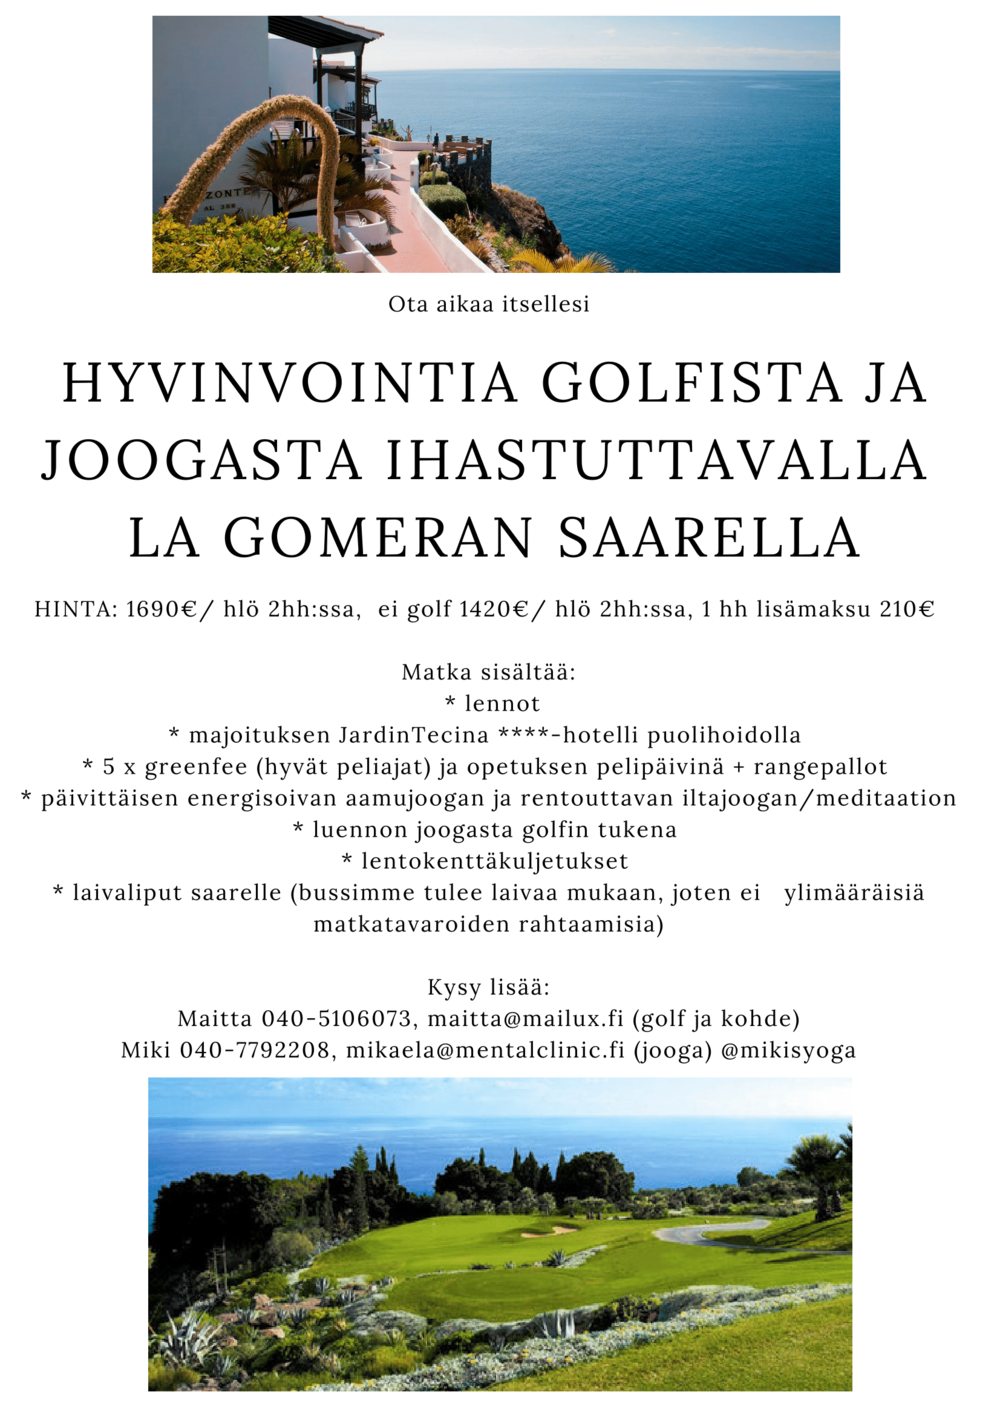 GolfJooga_LaGomera_21.-28.11.2018-2.png